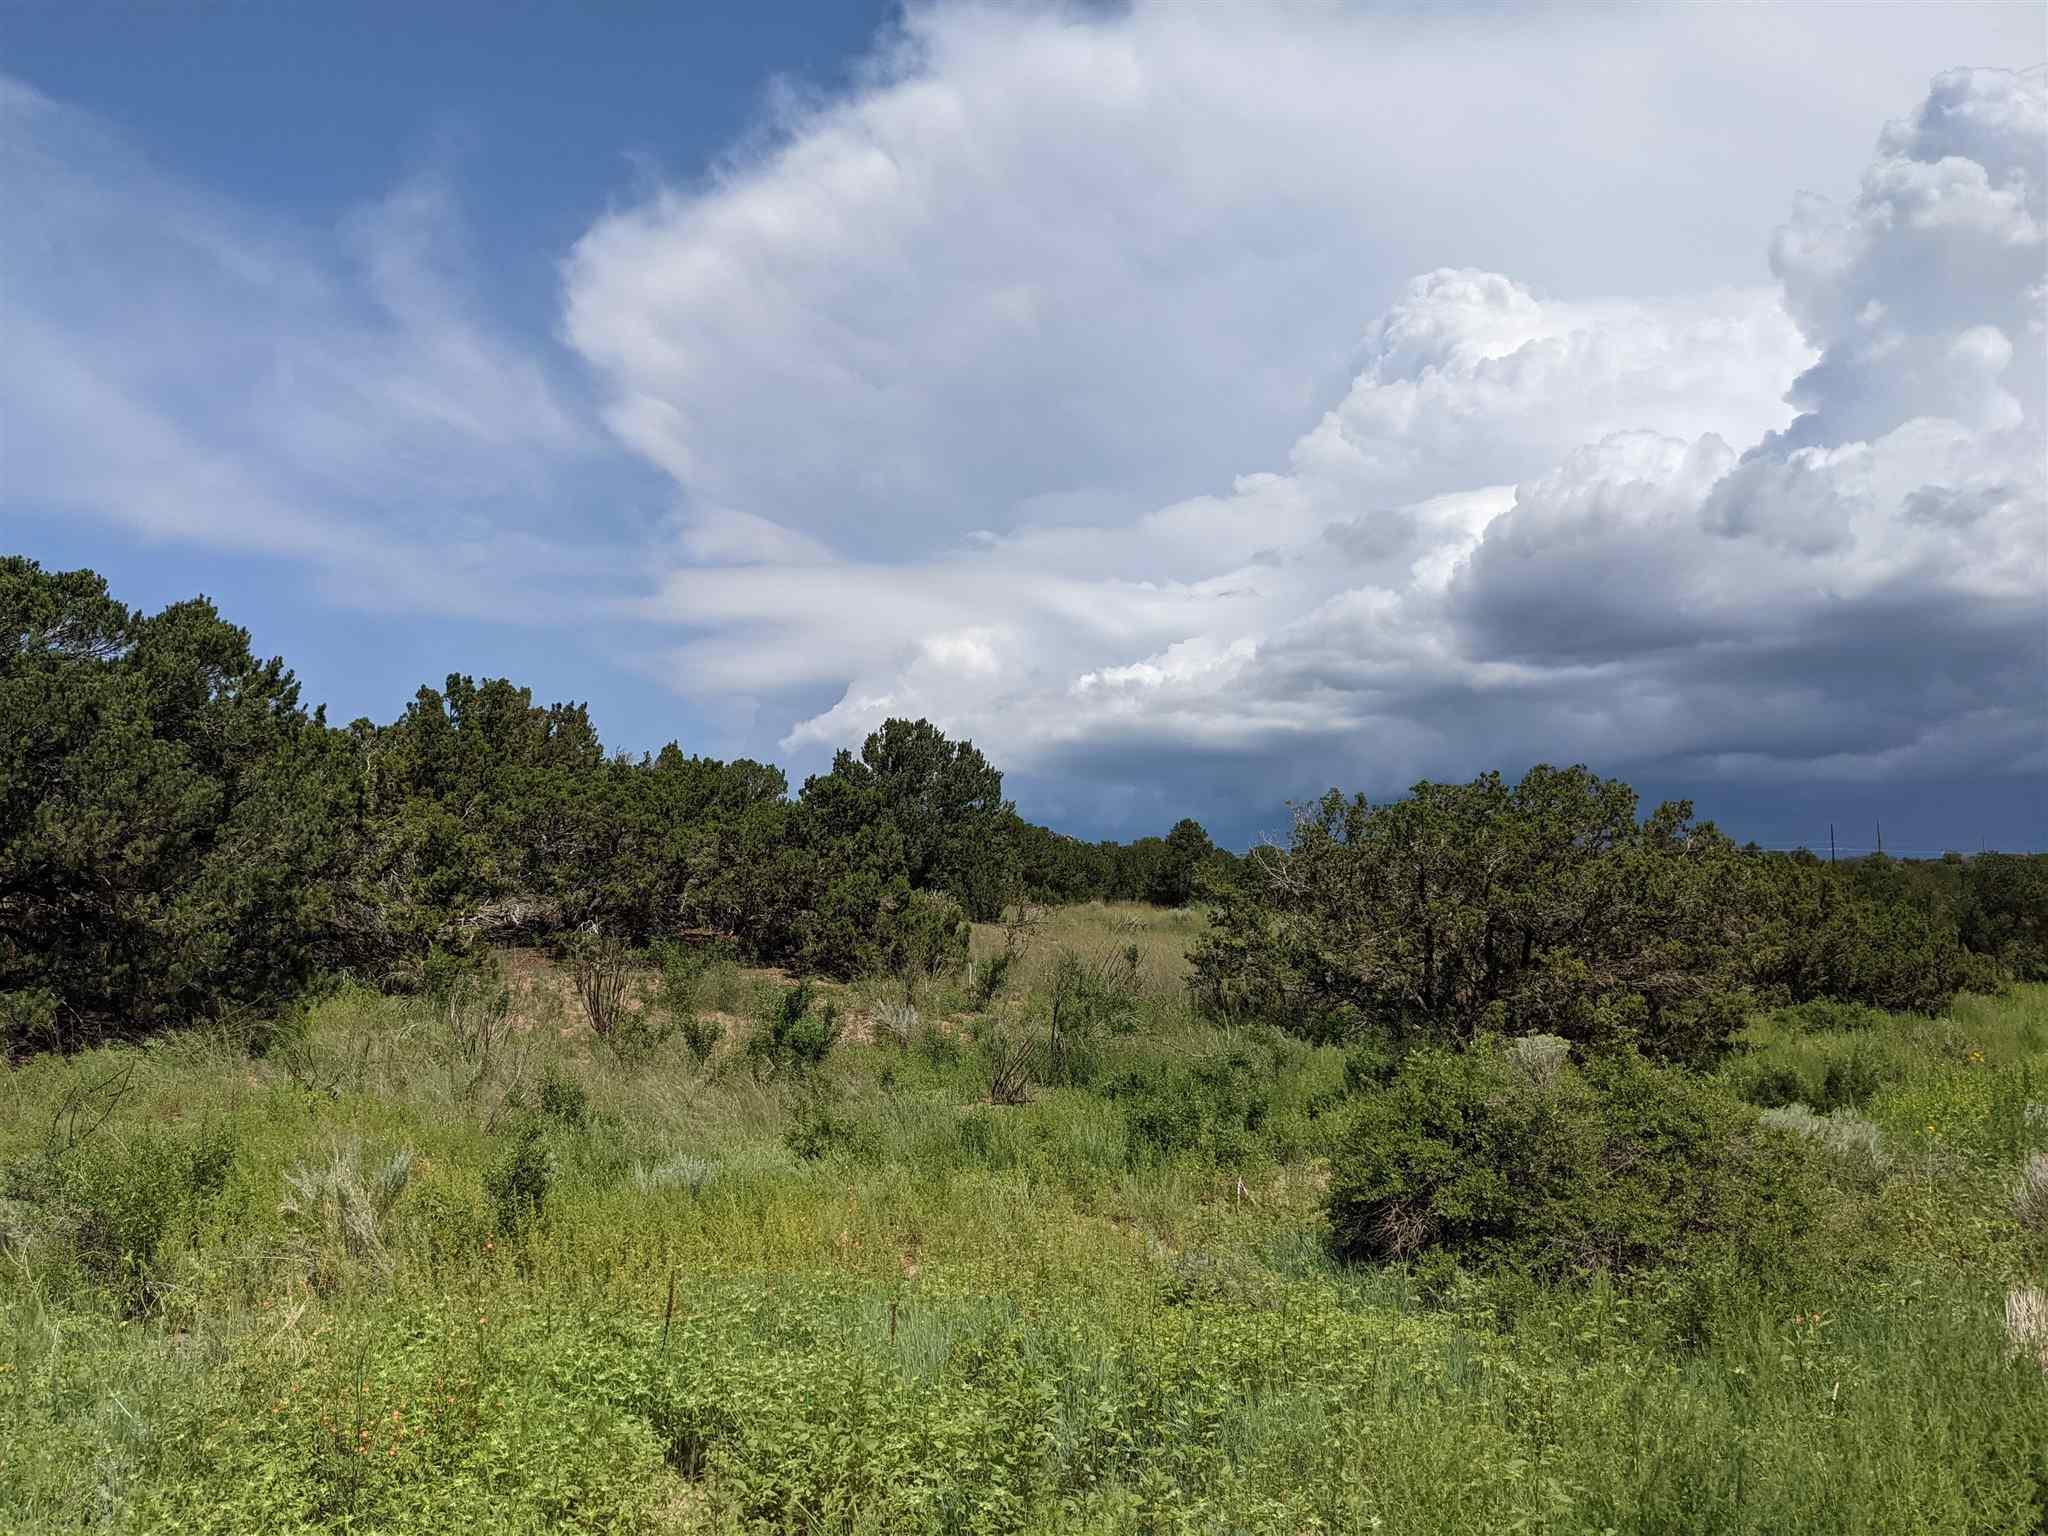 12 Camino Valle, Lamy NM 87508 - Photo 1